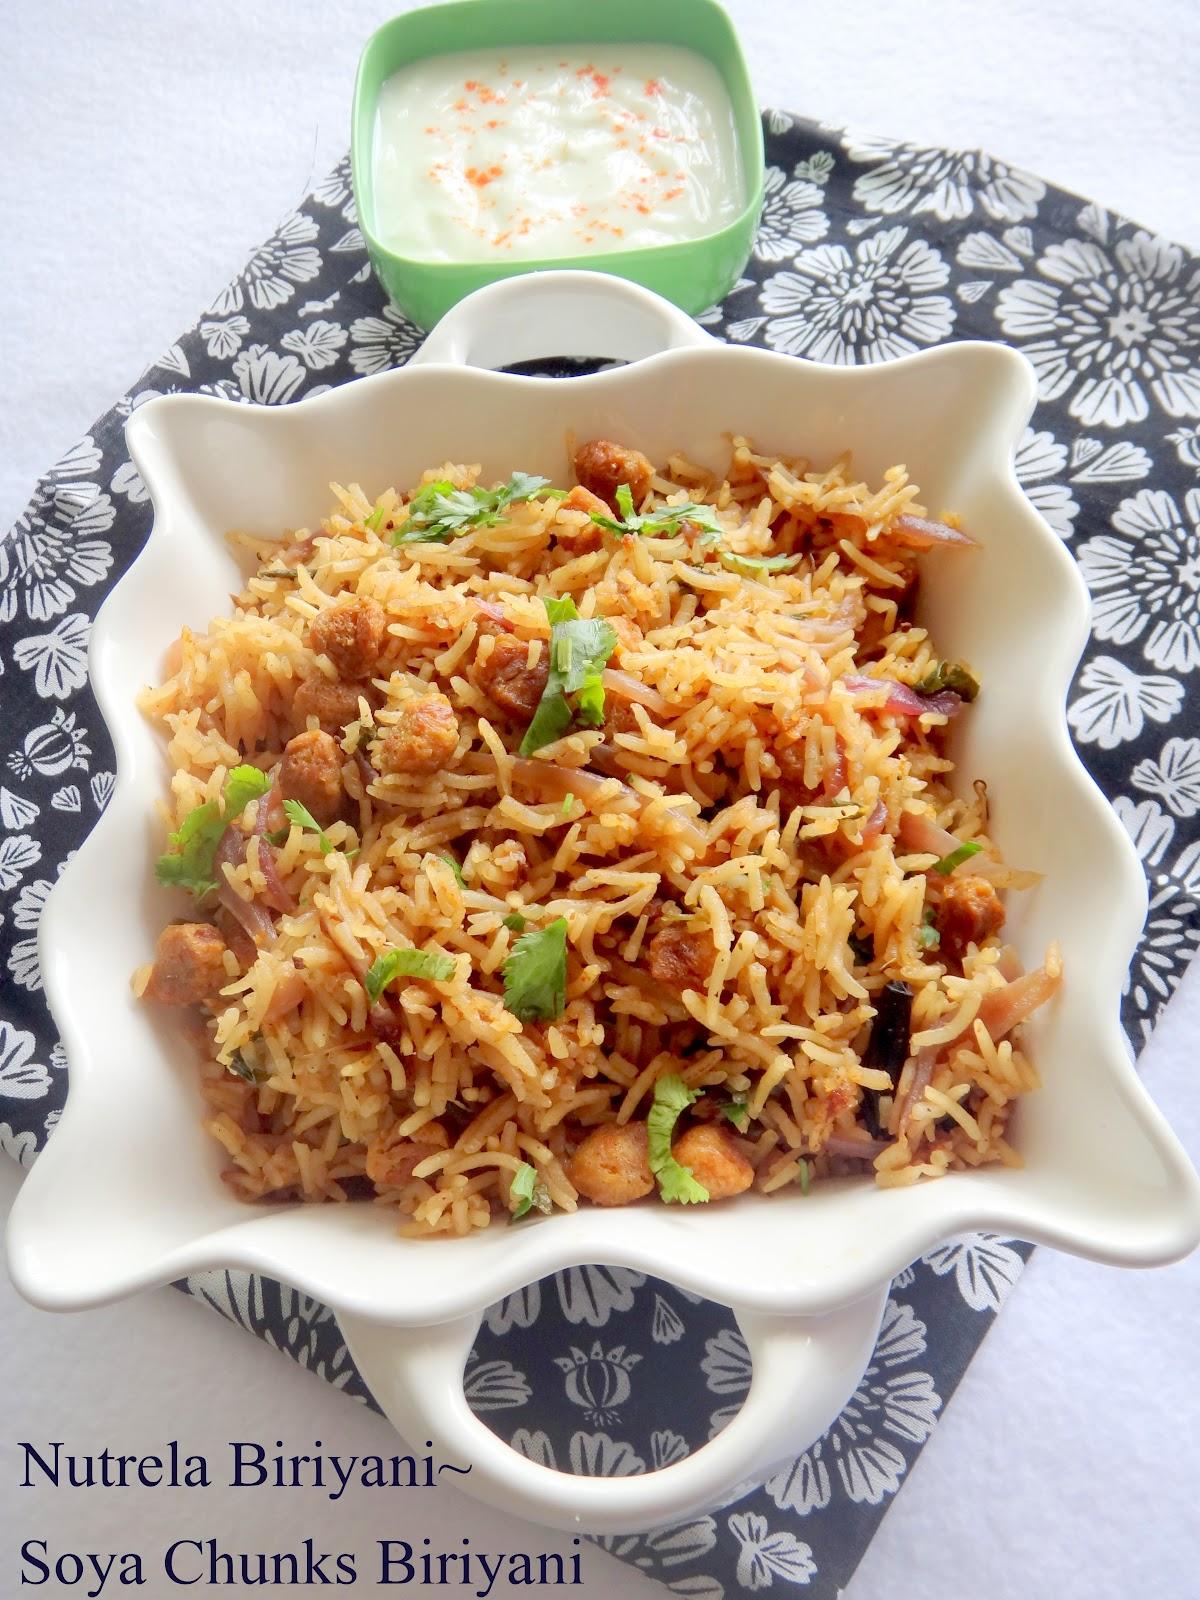 Prabha S Cooking Nutrela Biriyani Soya Chunks Biriyani